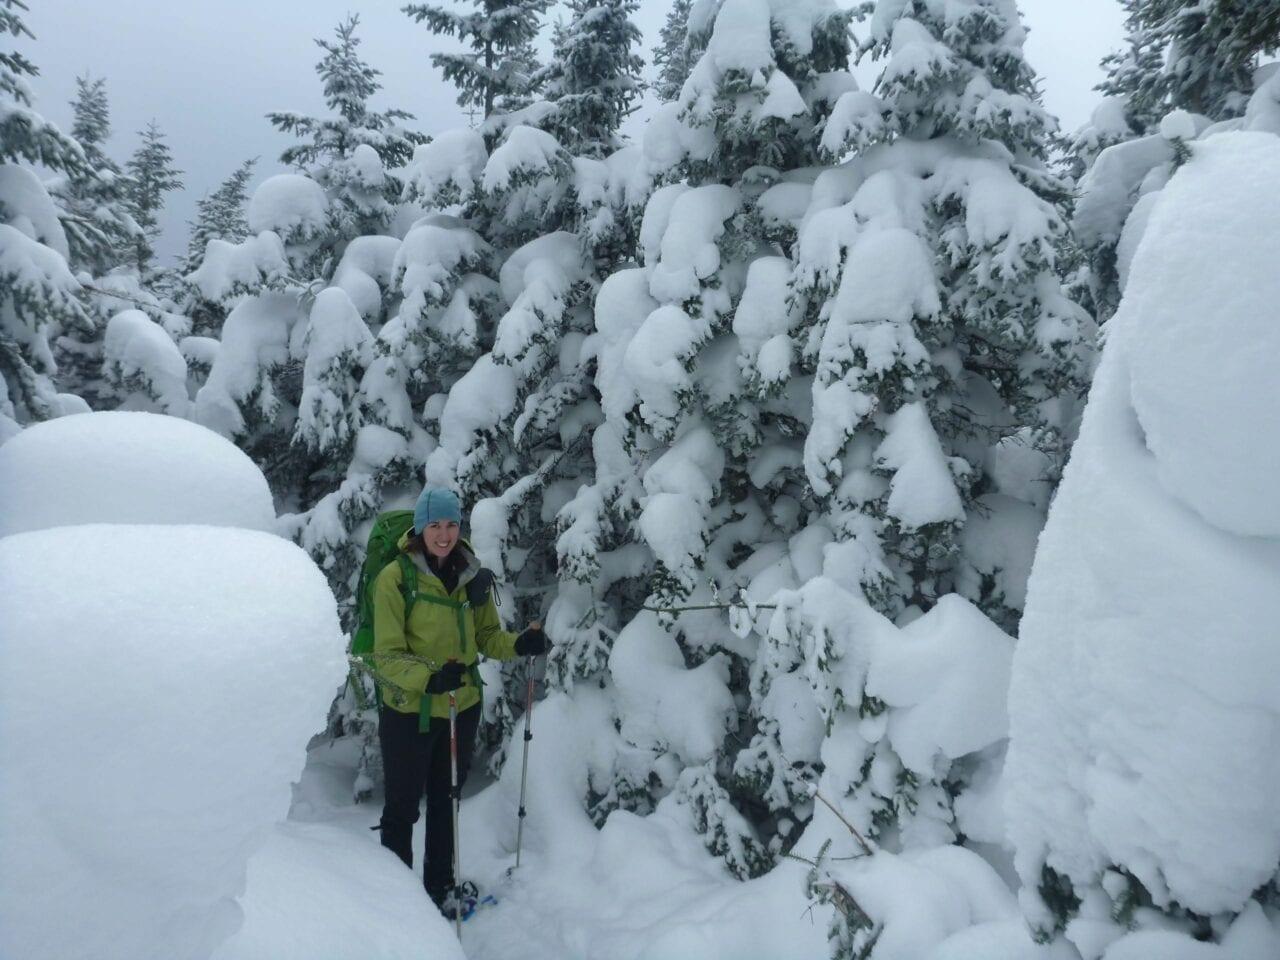 A hiker walks down a snow-covered trail.